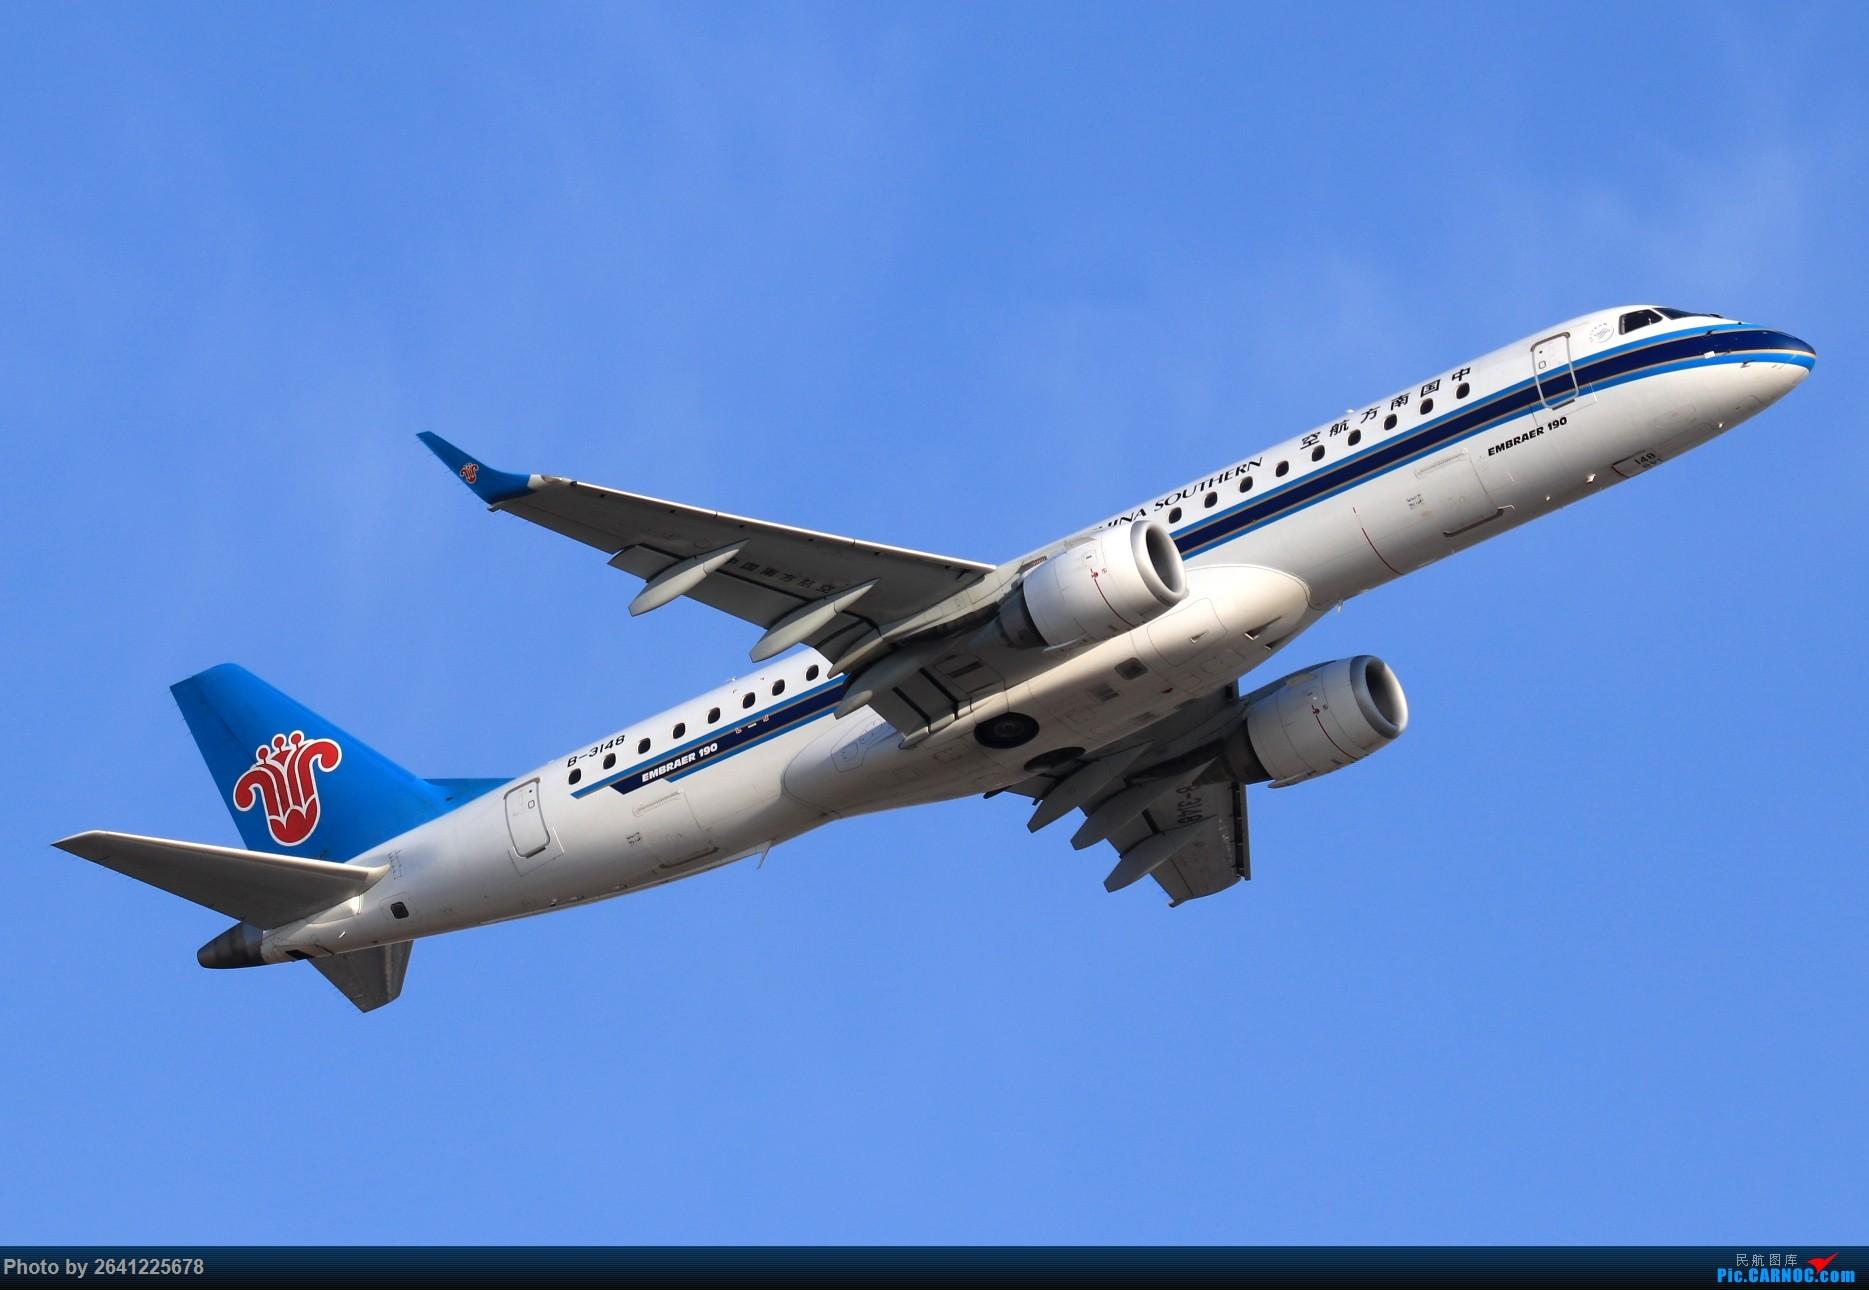 Re:[原创]【小周游记第7集拍机贴】乌鲁木齐绝美的地景和光线 EMBRAER E-190 B-3148 中国乌鲁木齐地窝堡国际机场